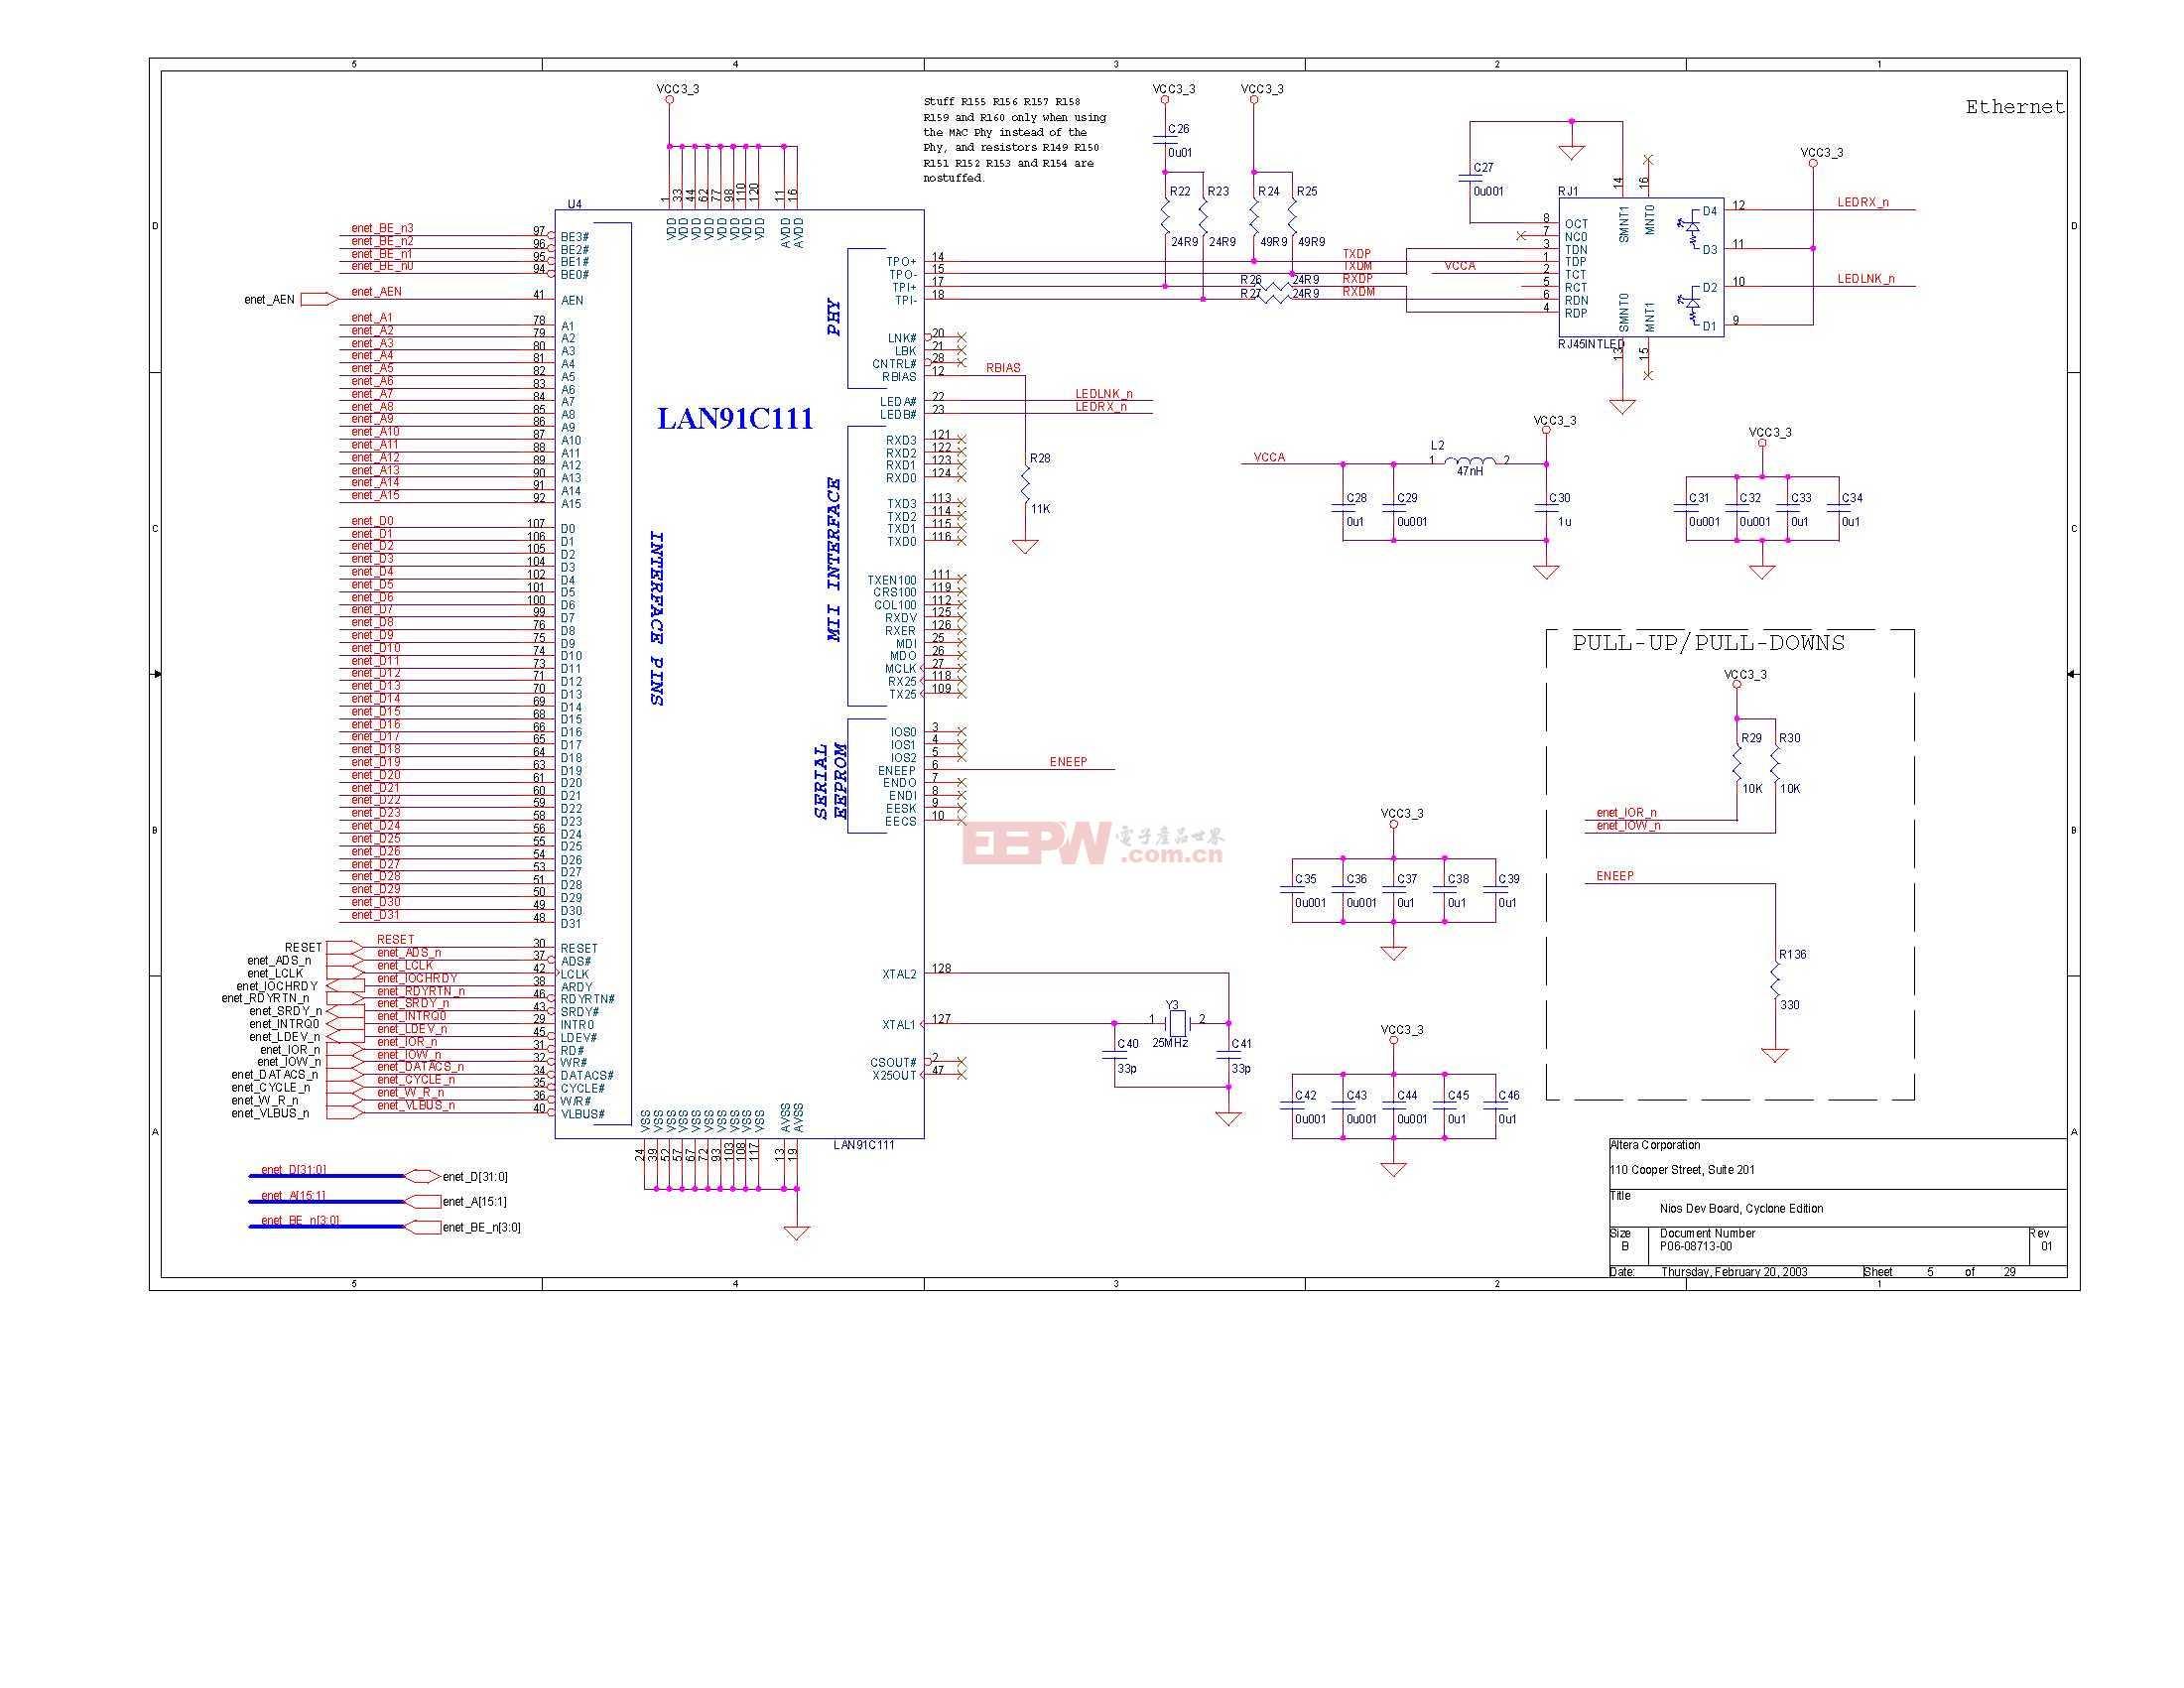 NIOS开发板电路图(Altera官方版)04